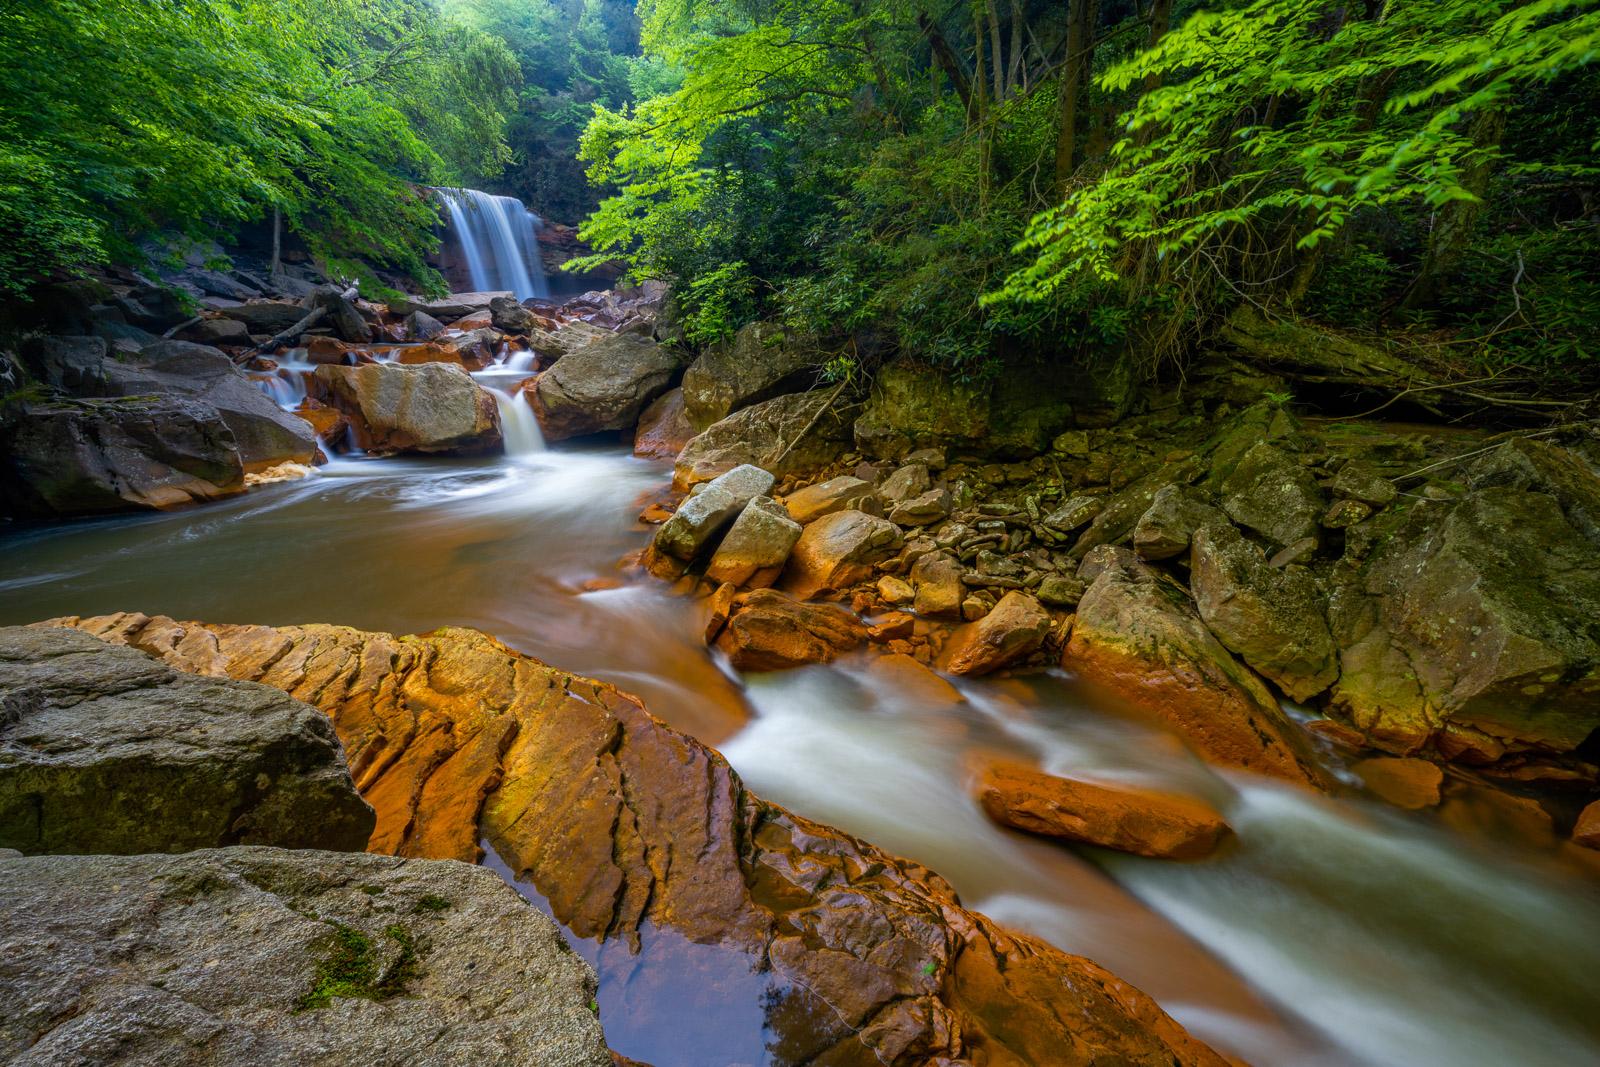 Springtime at Douglas Falls near Thomas, West Virginia. Douglas Falls is a beautiful waterfall on the Northfork Blackwater River...